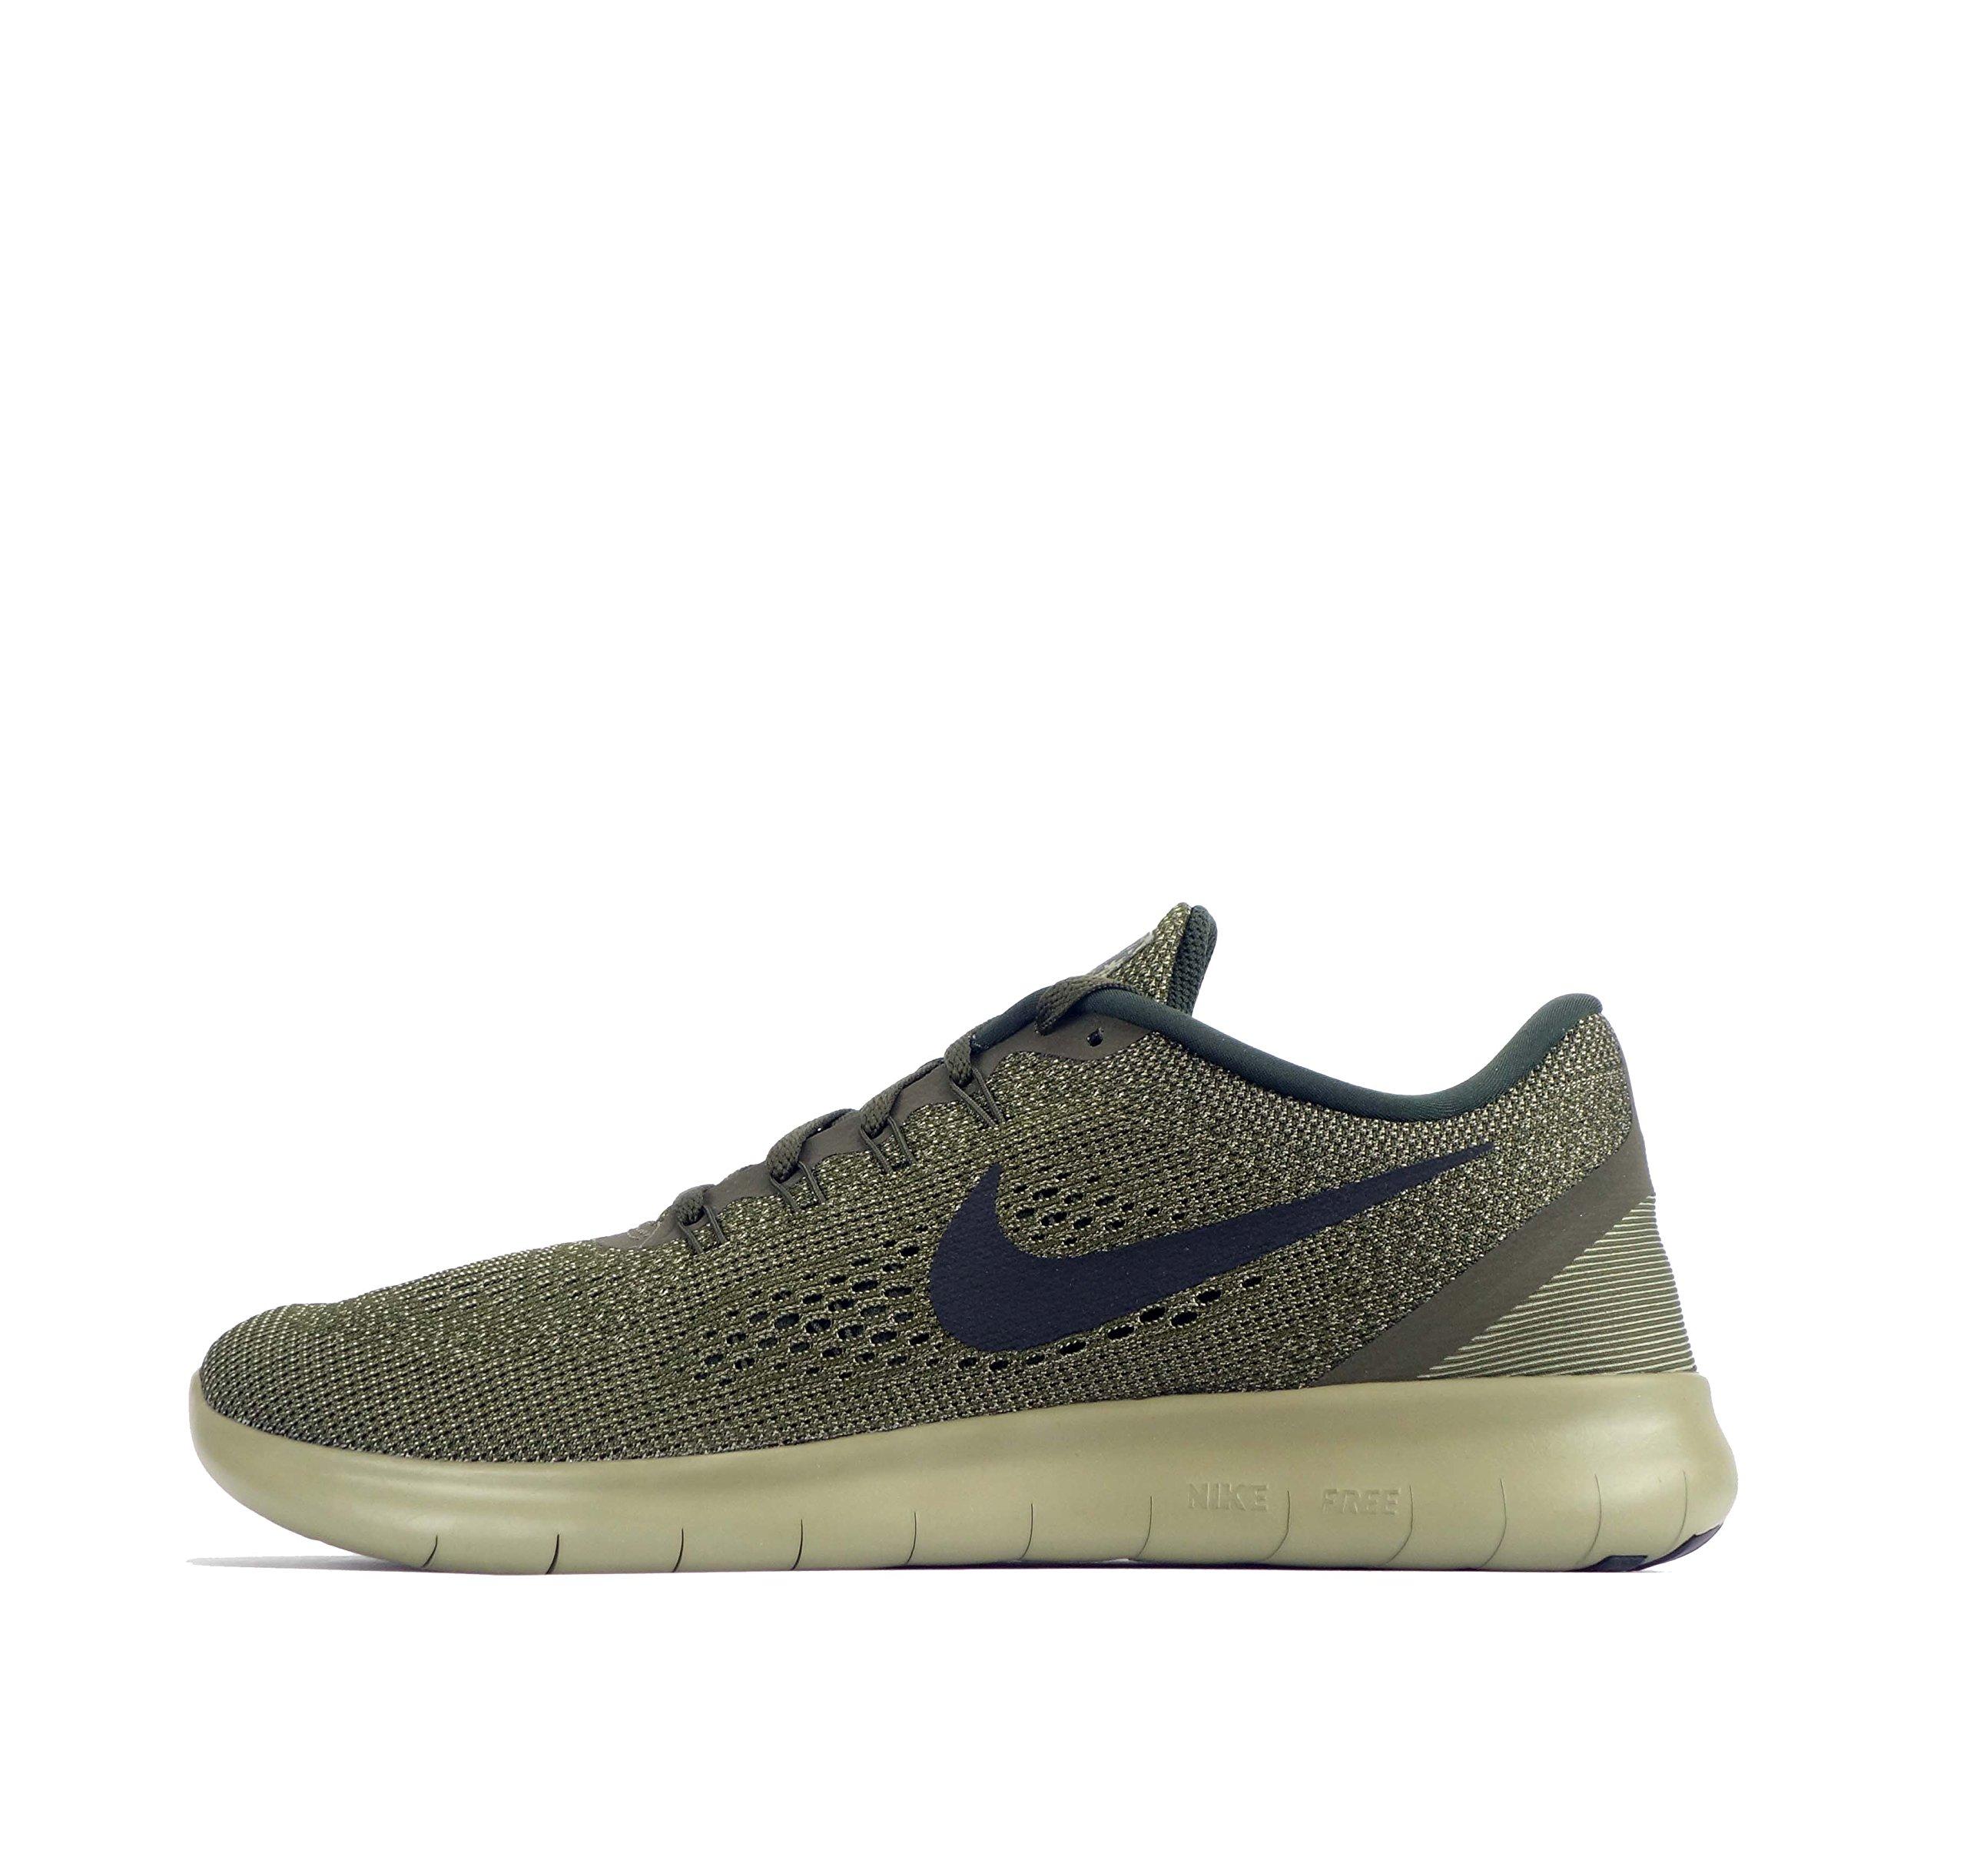 Nike Mens Free Rn Running Shoe (Olive, 8.5)